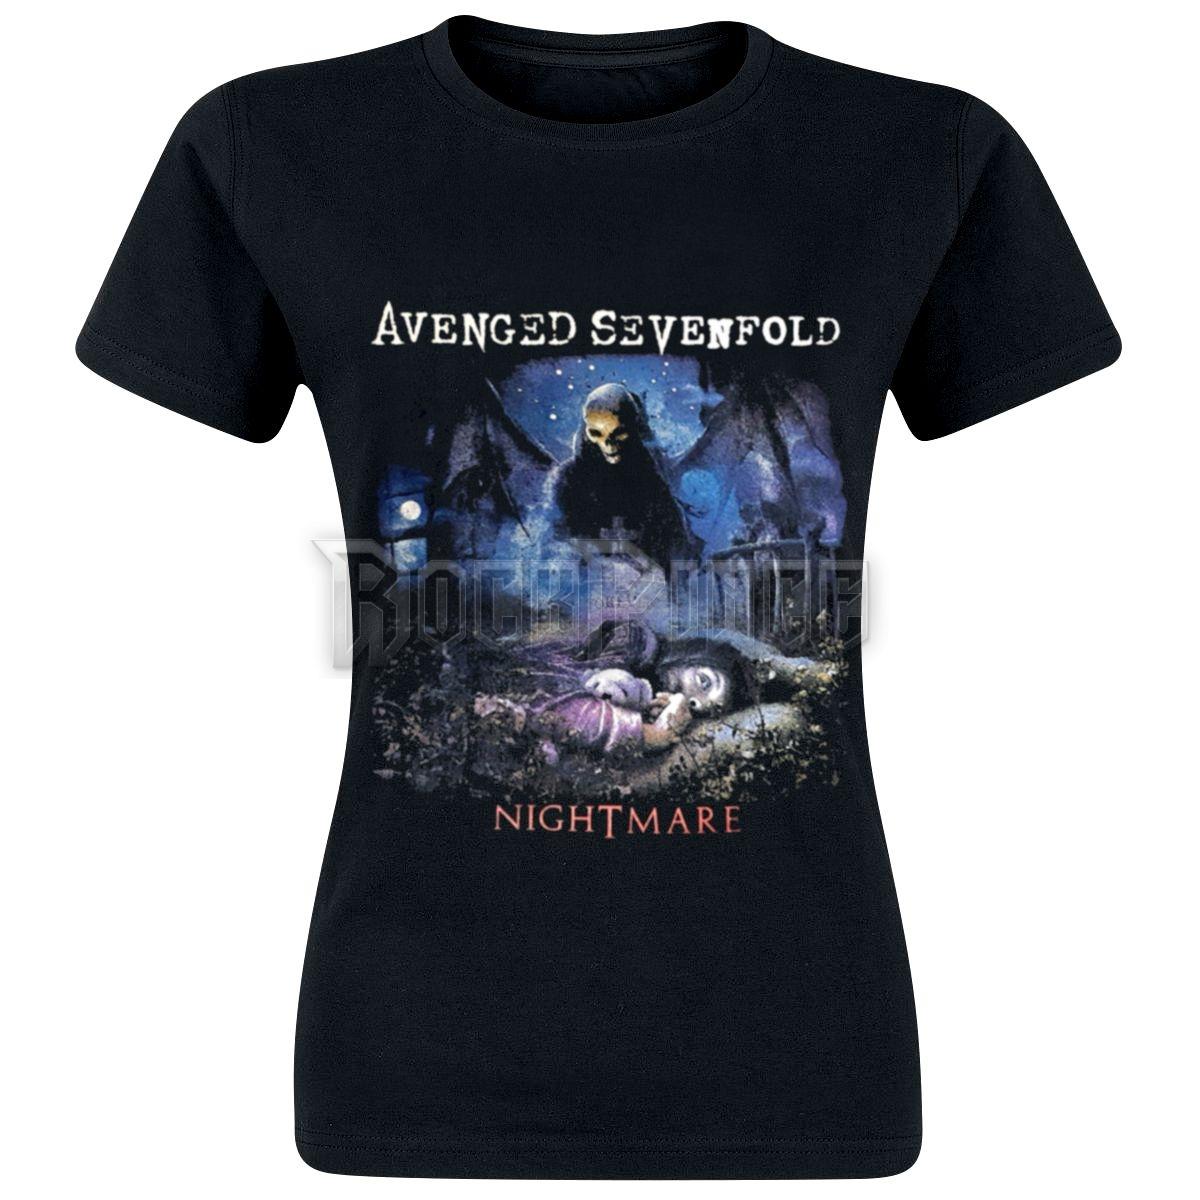 Avenged Sevenfold - Nightmare - női póló